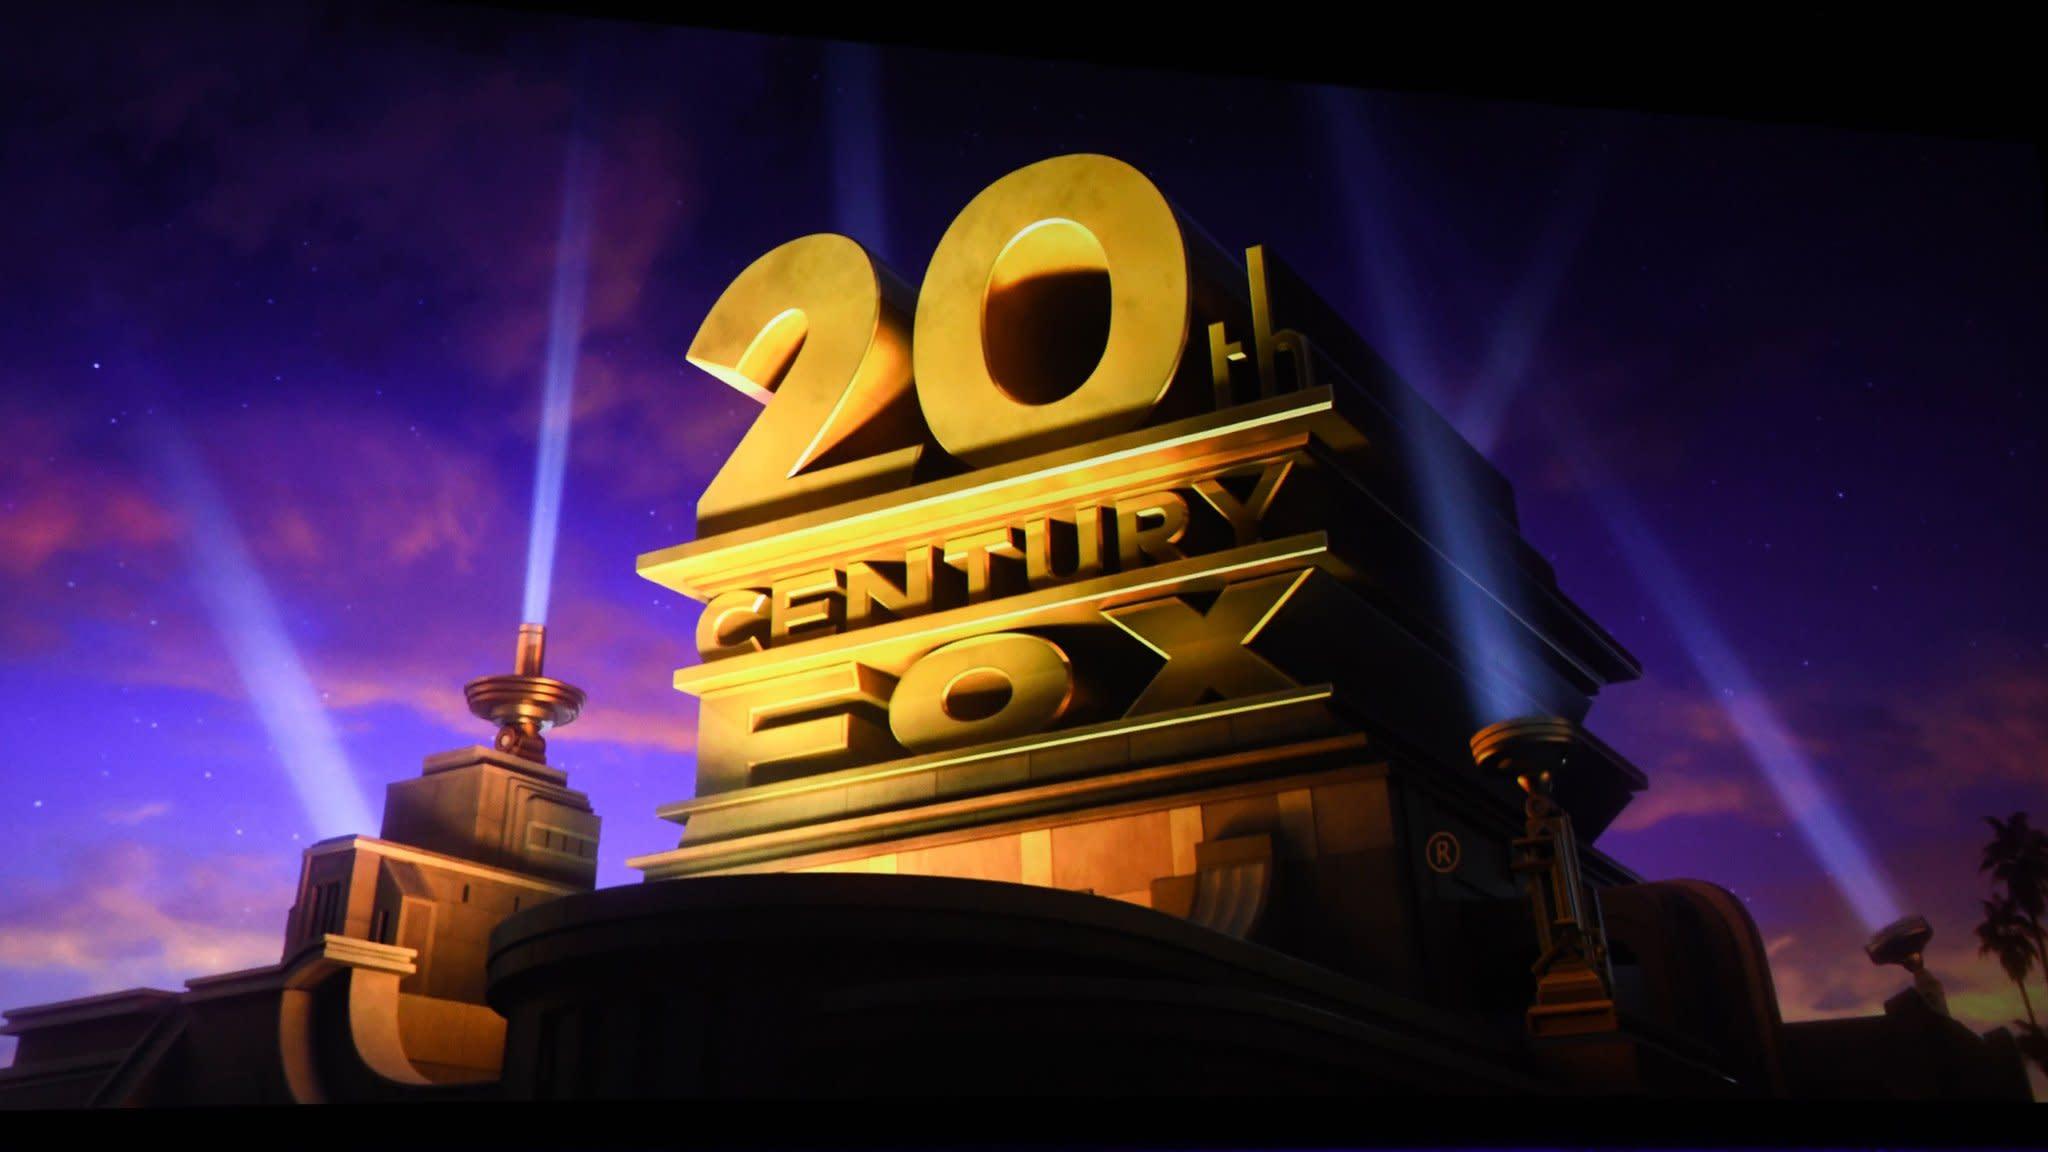 Disney ends the historic 20th Century Fox brand thumbnail